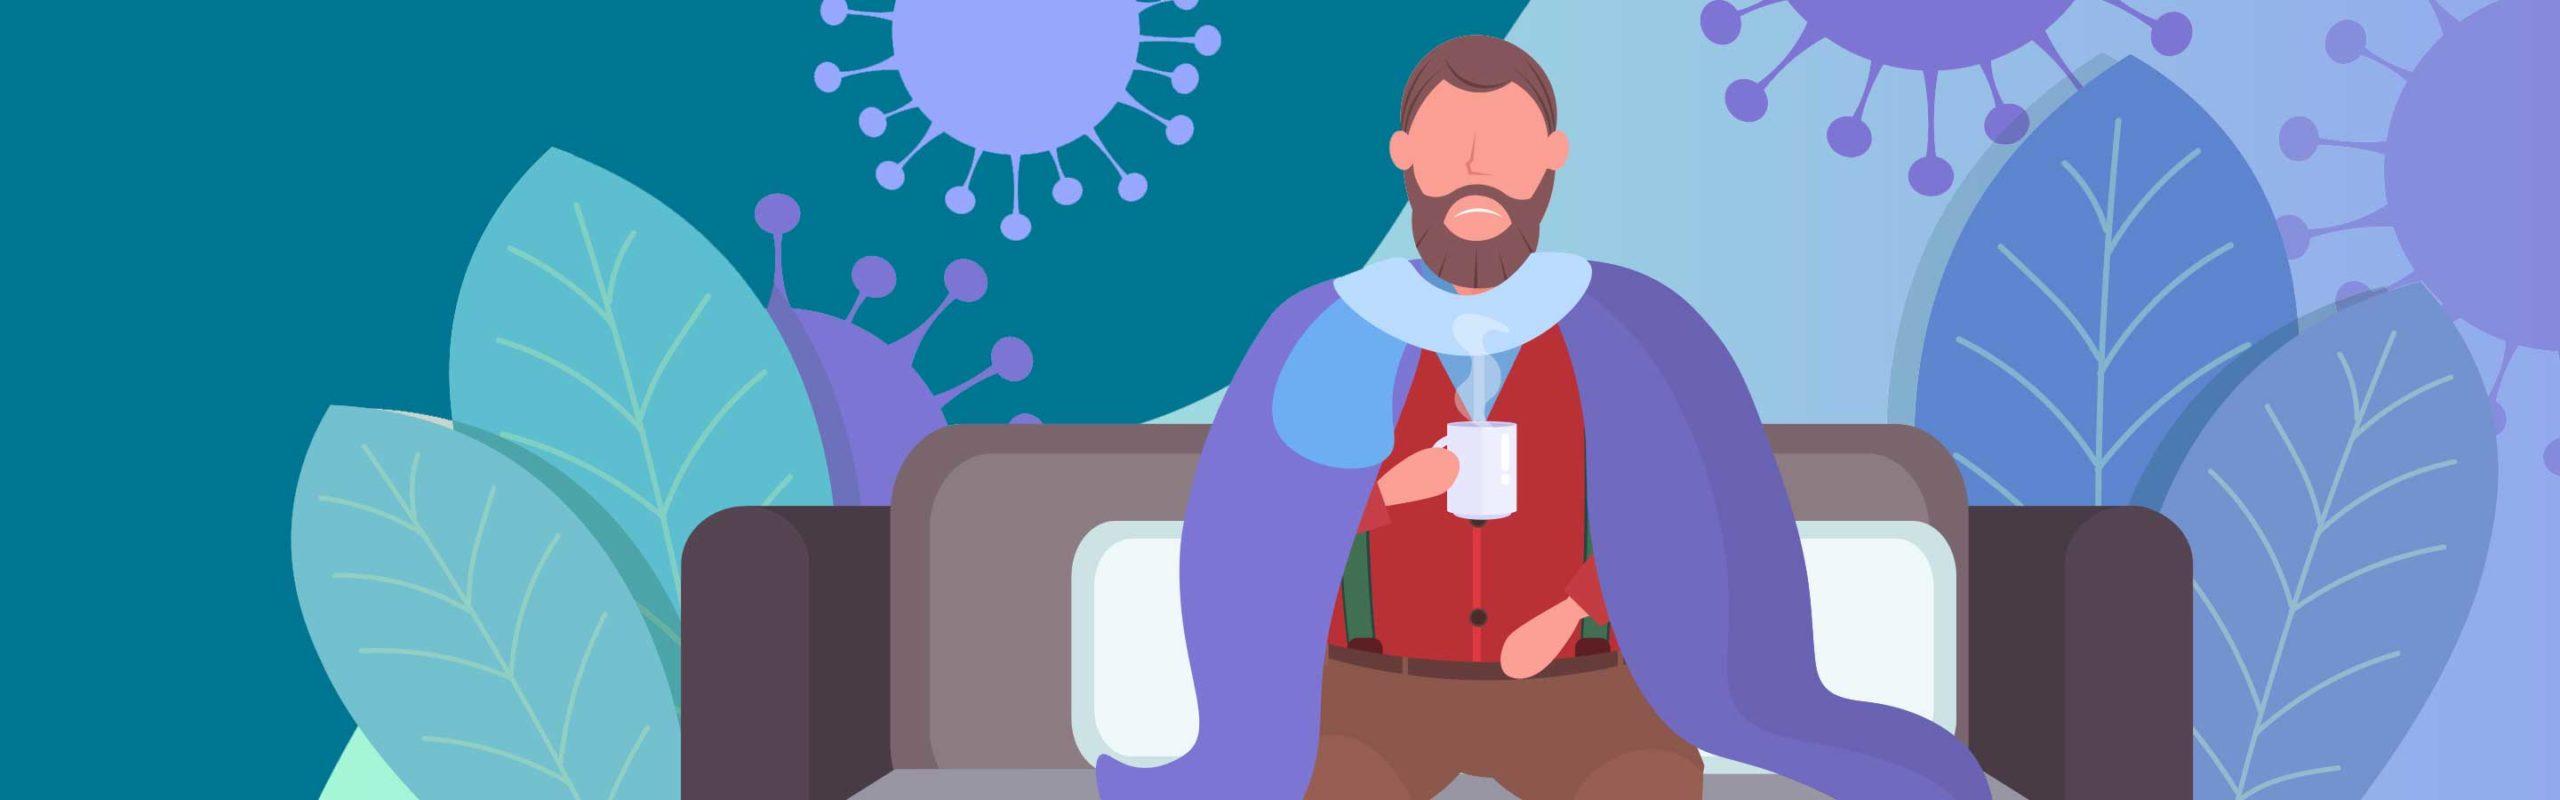 ¿Qué hago si tengo Coronavirus?